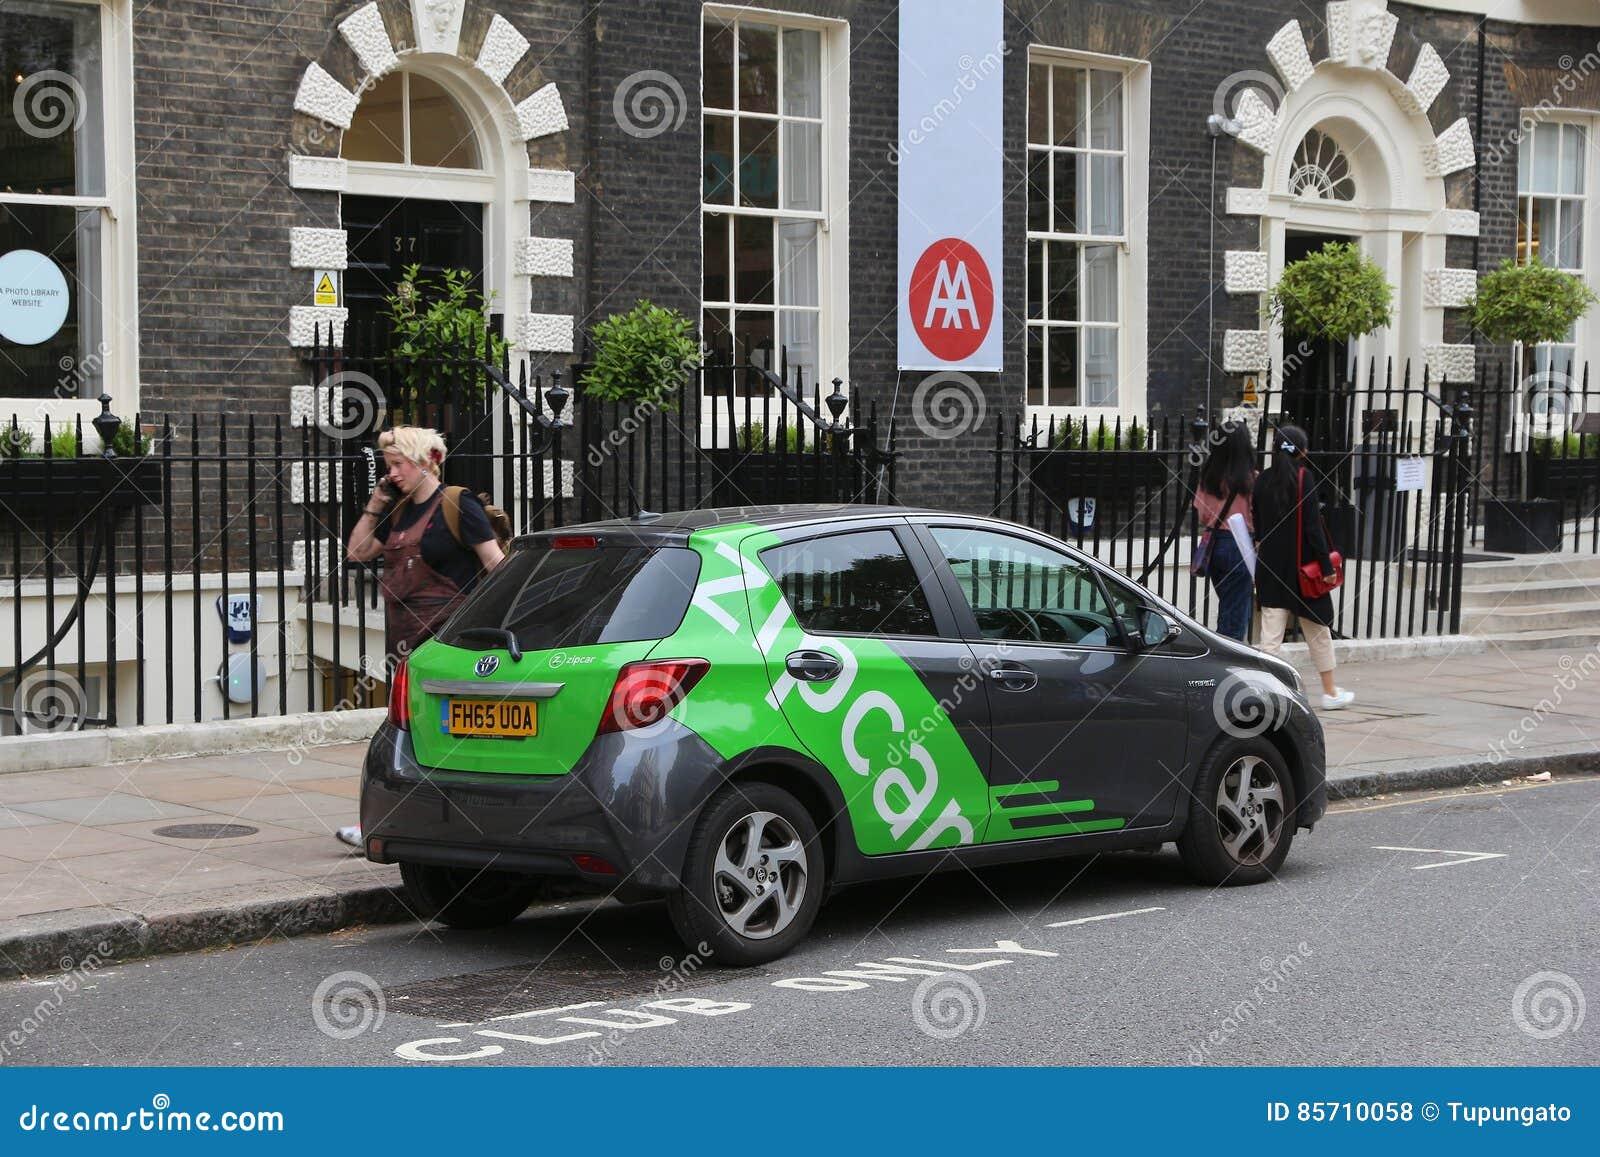 zipcar business plan